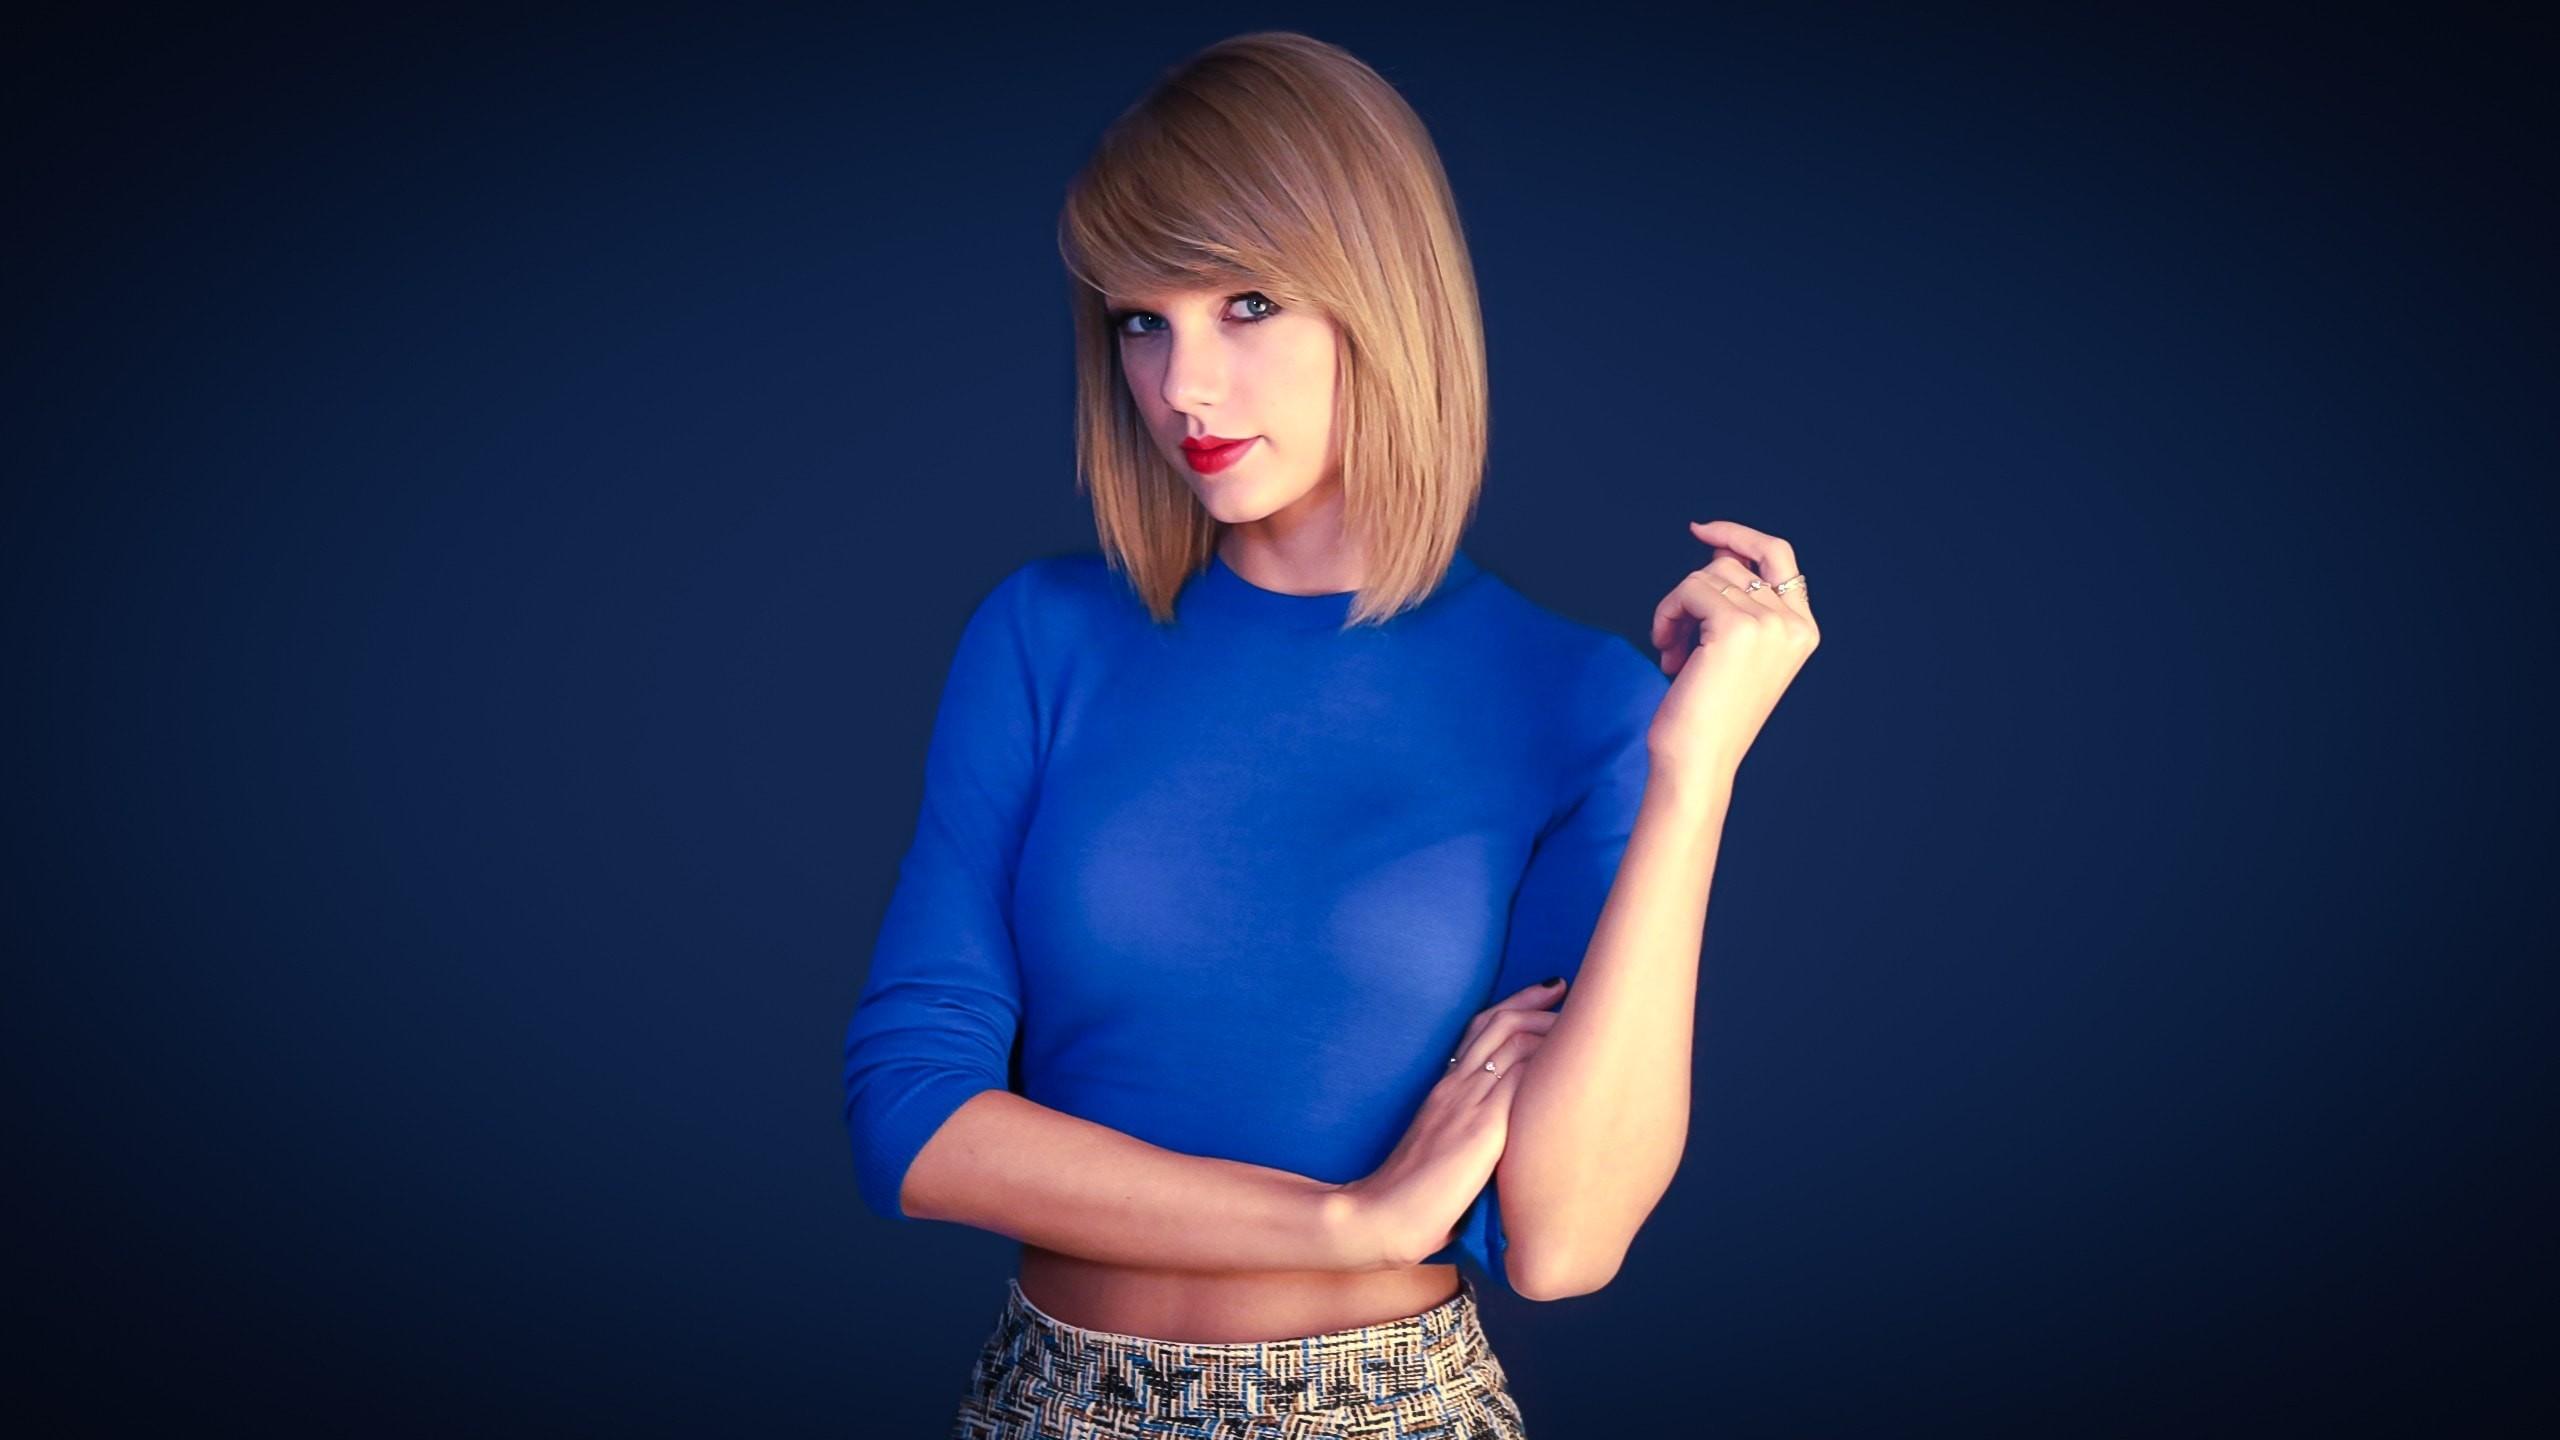 Taylor swift blue tshirt